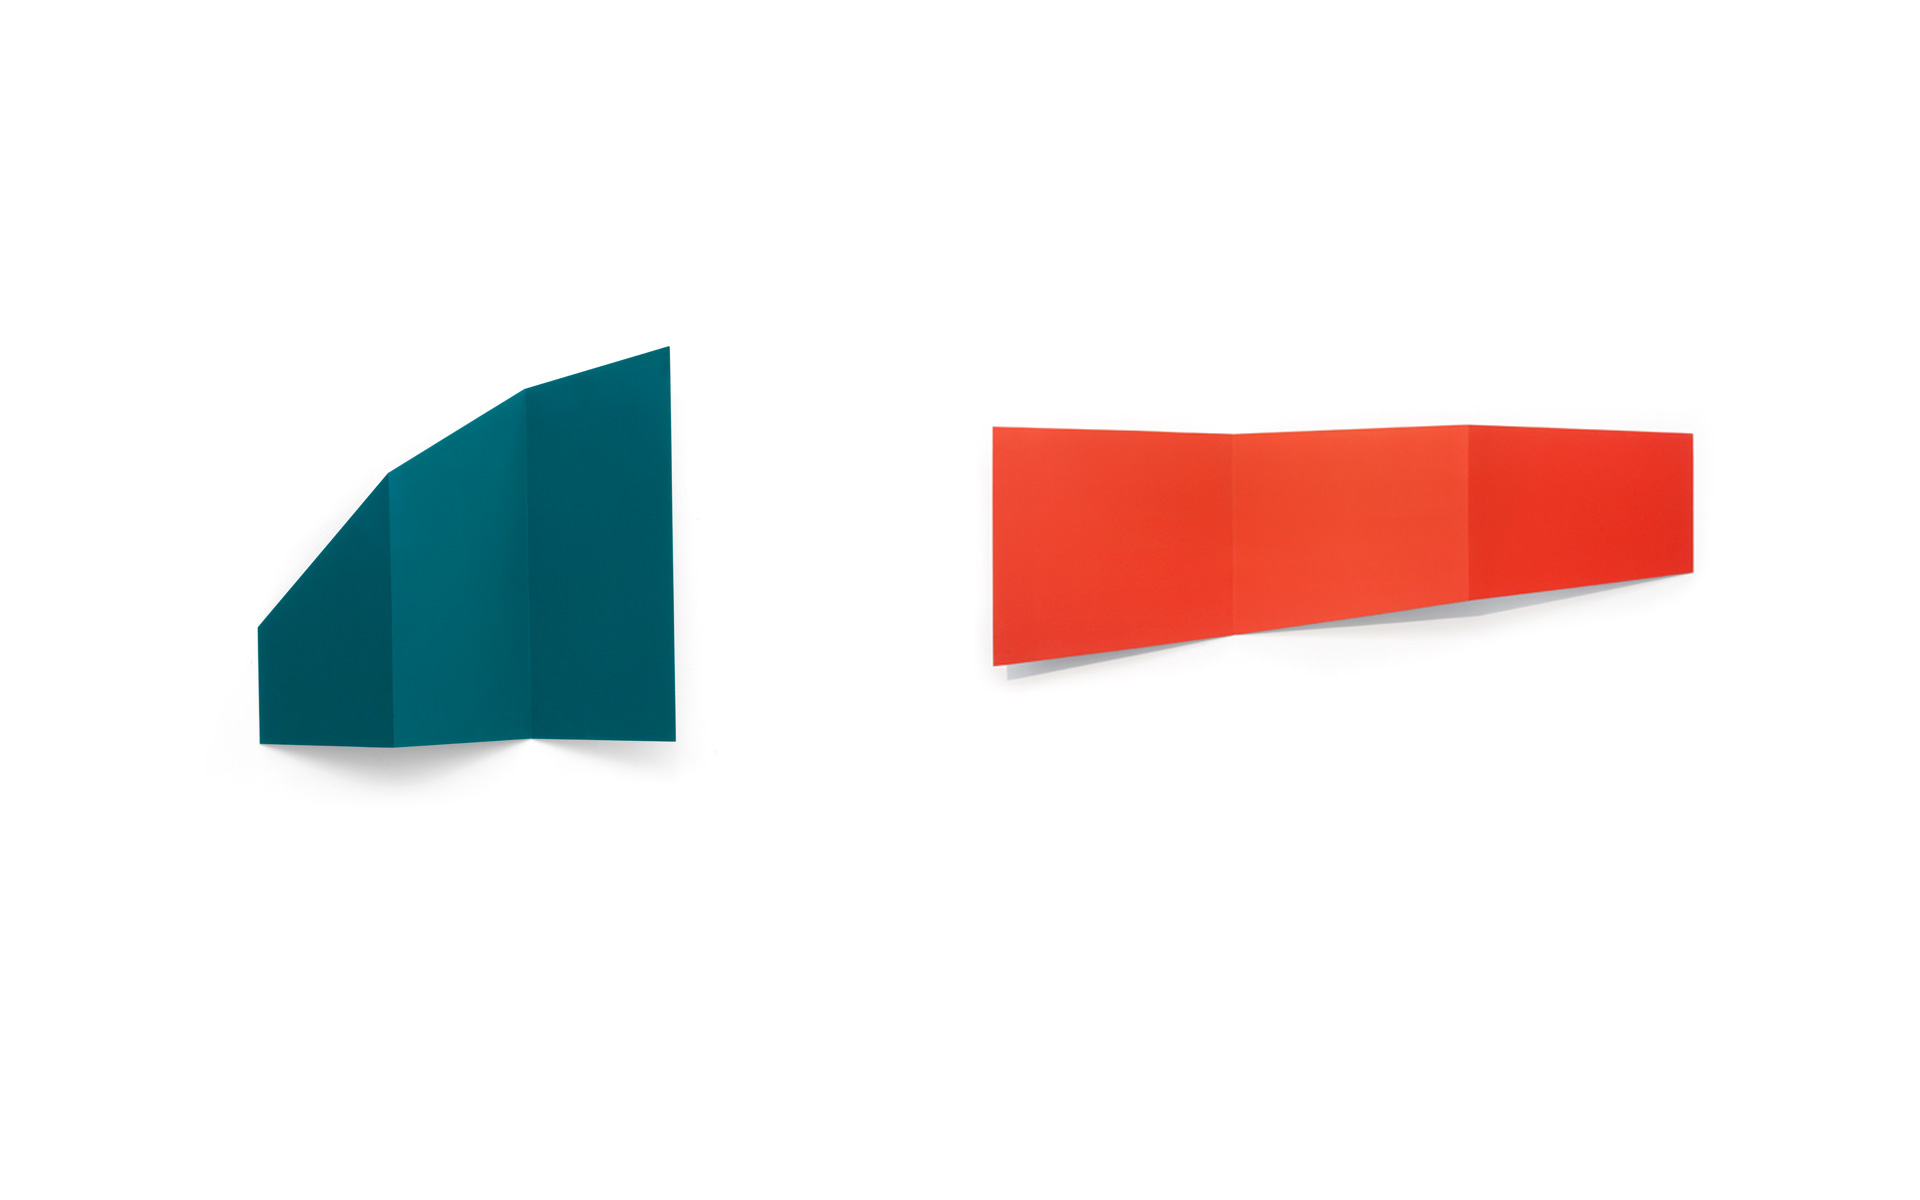 left: FALTUNG, 1992 Acrylic on steel 71.8 × 76 × 11.5 cm / right: MODES VIII, 1992 Acrylic on steel 50 × 150 × 12 cm - Photos: Christoph Valentien